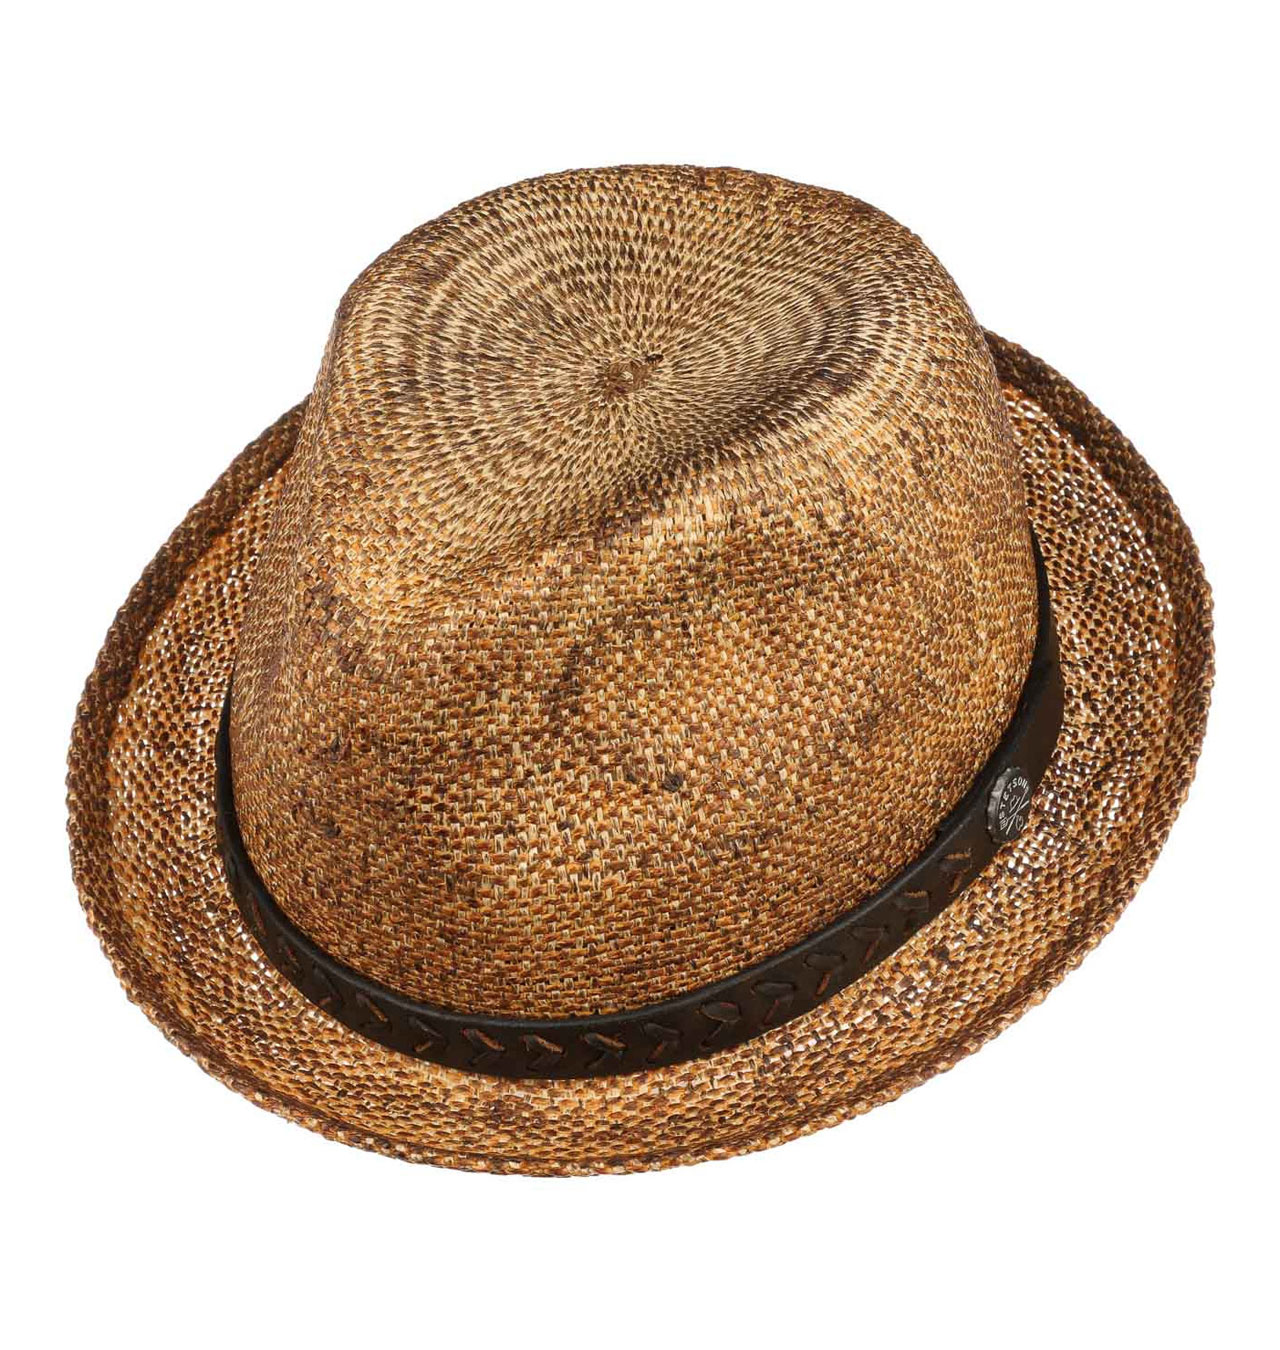 e60e922cd73 Stetson - BBQ Toyo Player Hat Straw Hat - Brown